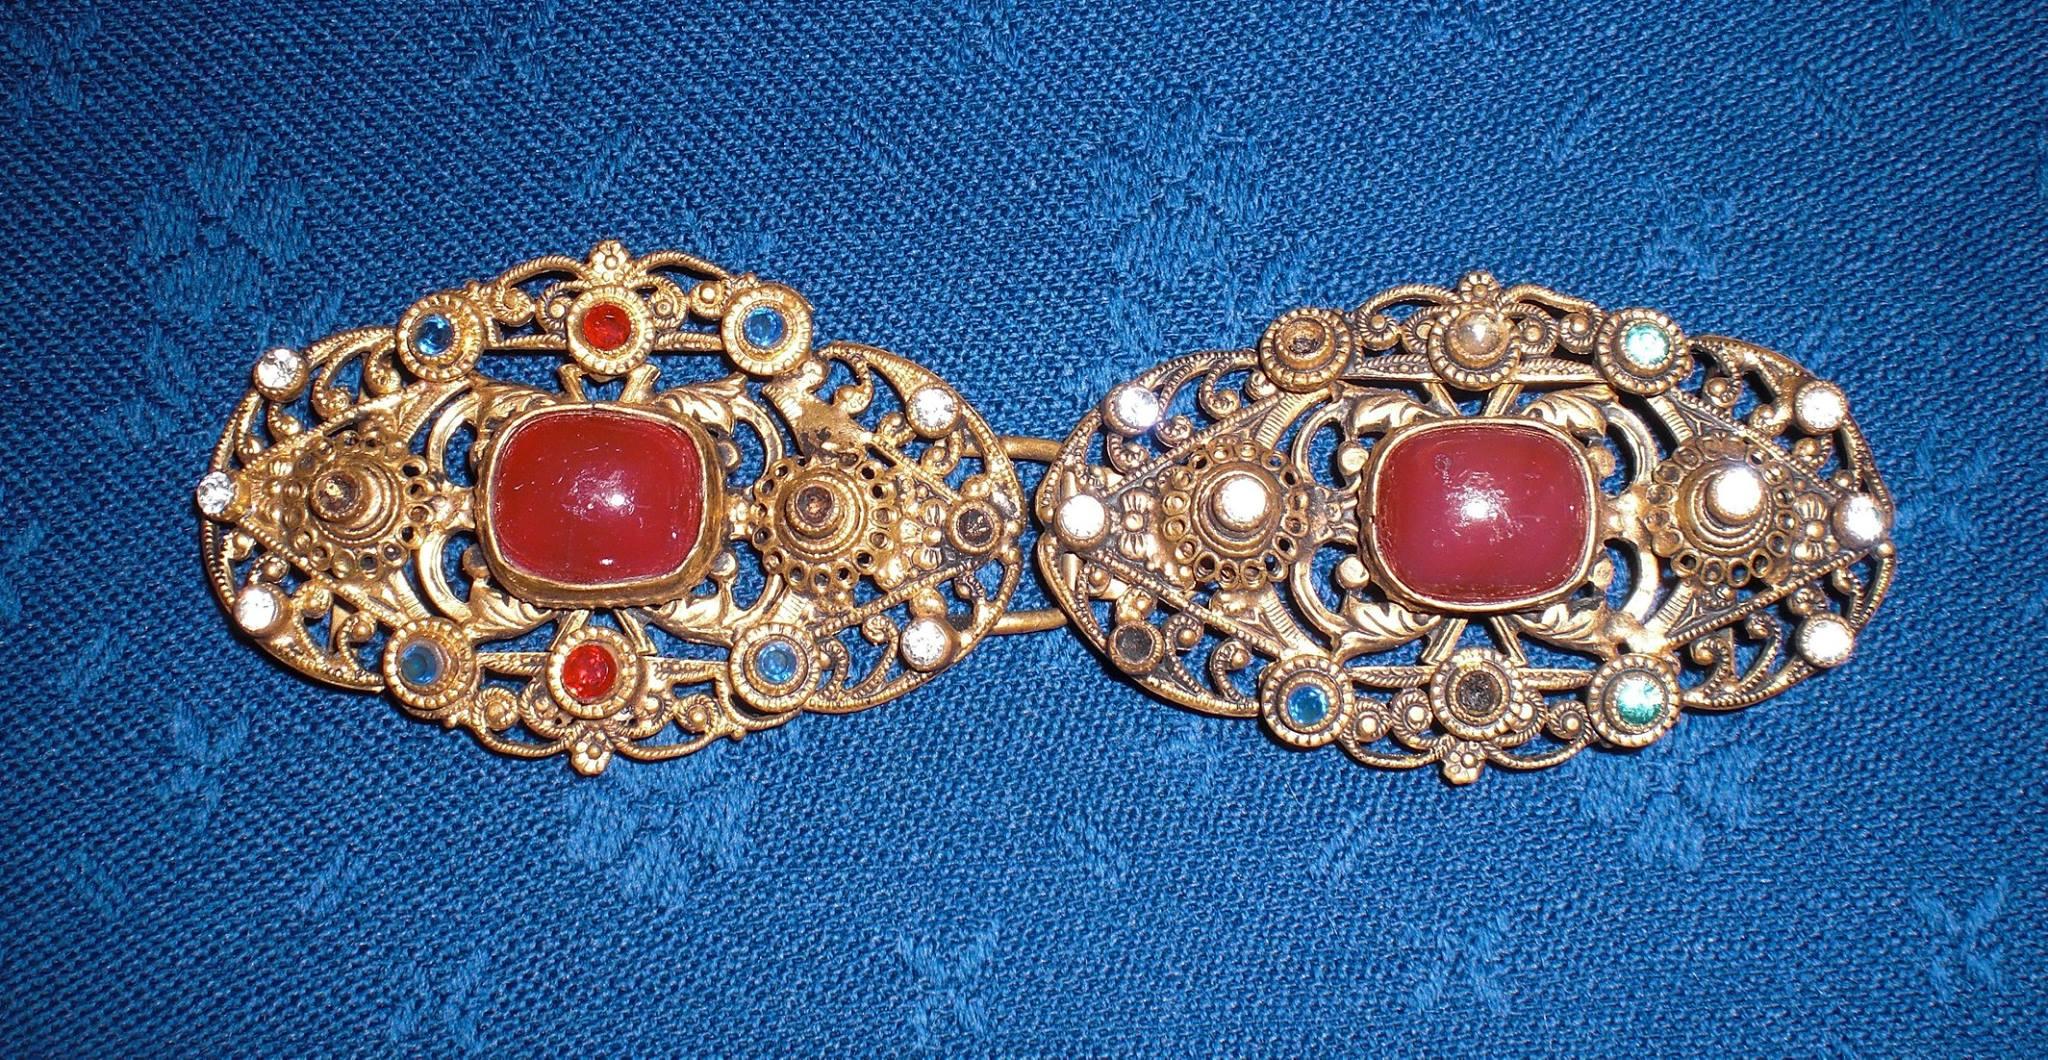 Alte, original Schließe , vergoldet